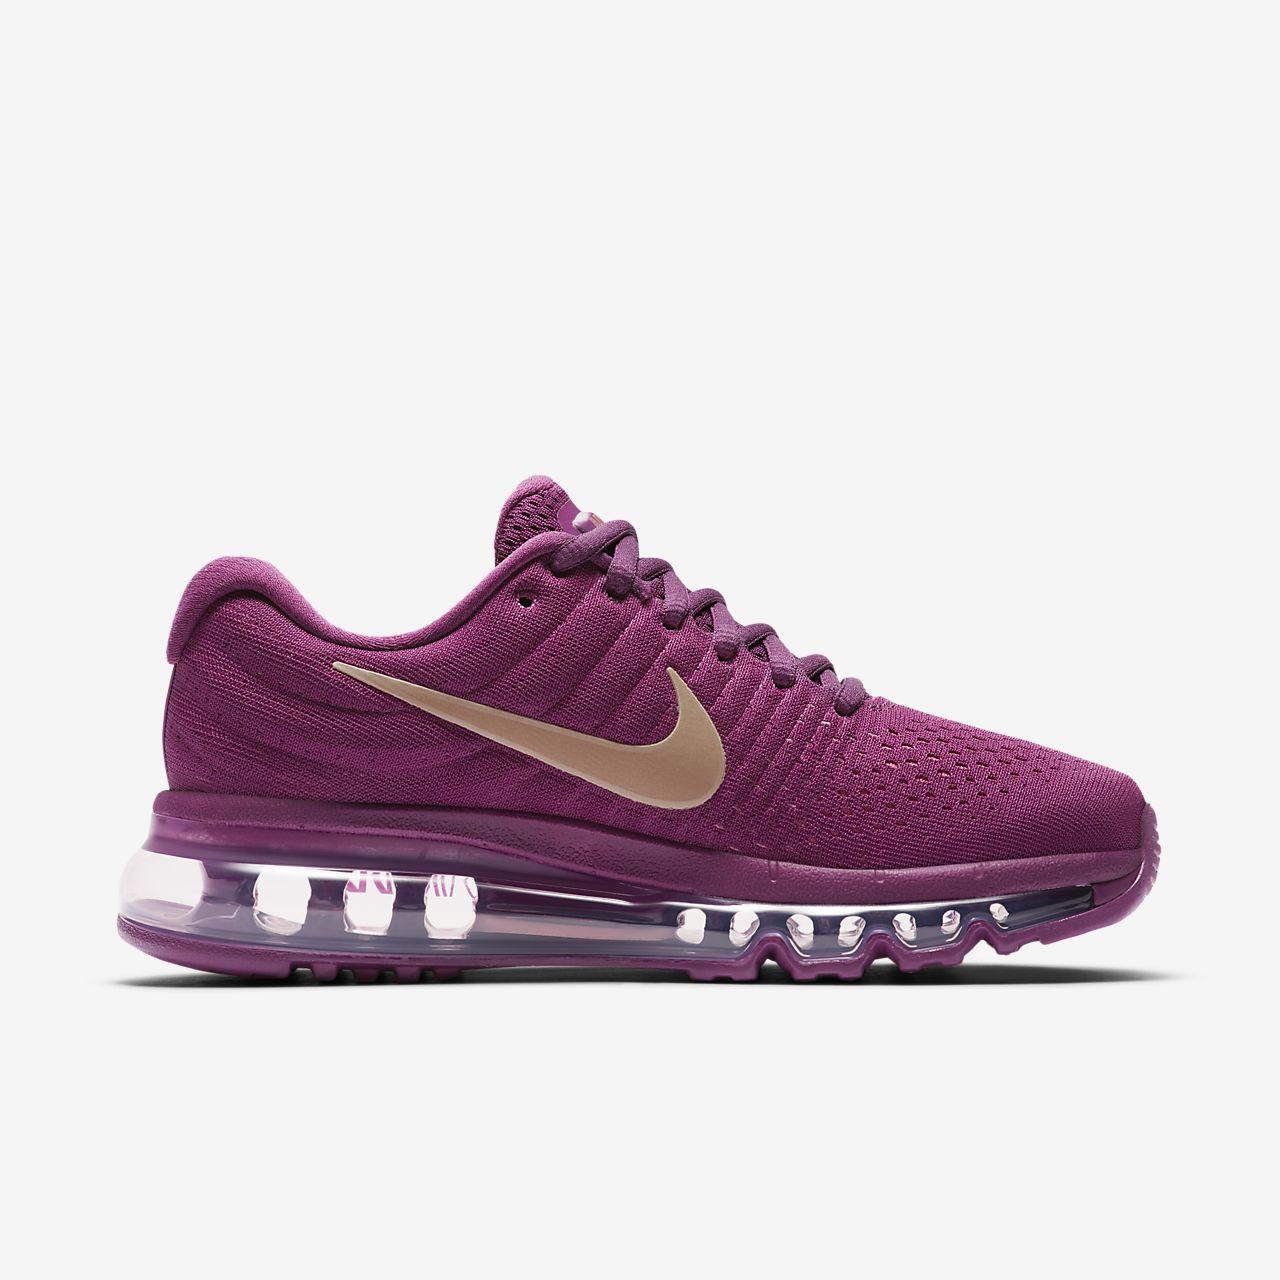 Nike Air Max 2017 Chaussures Soi Baskets Lo Violet Lilas NbgR2asI0